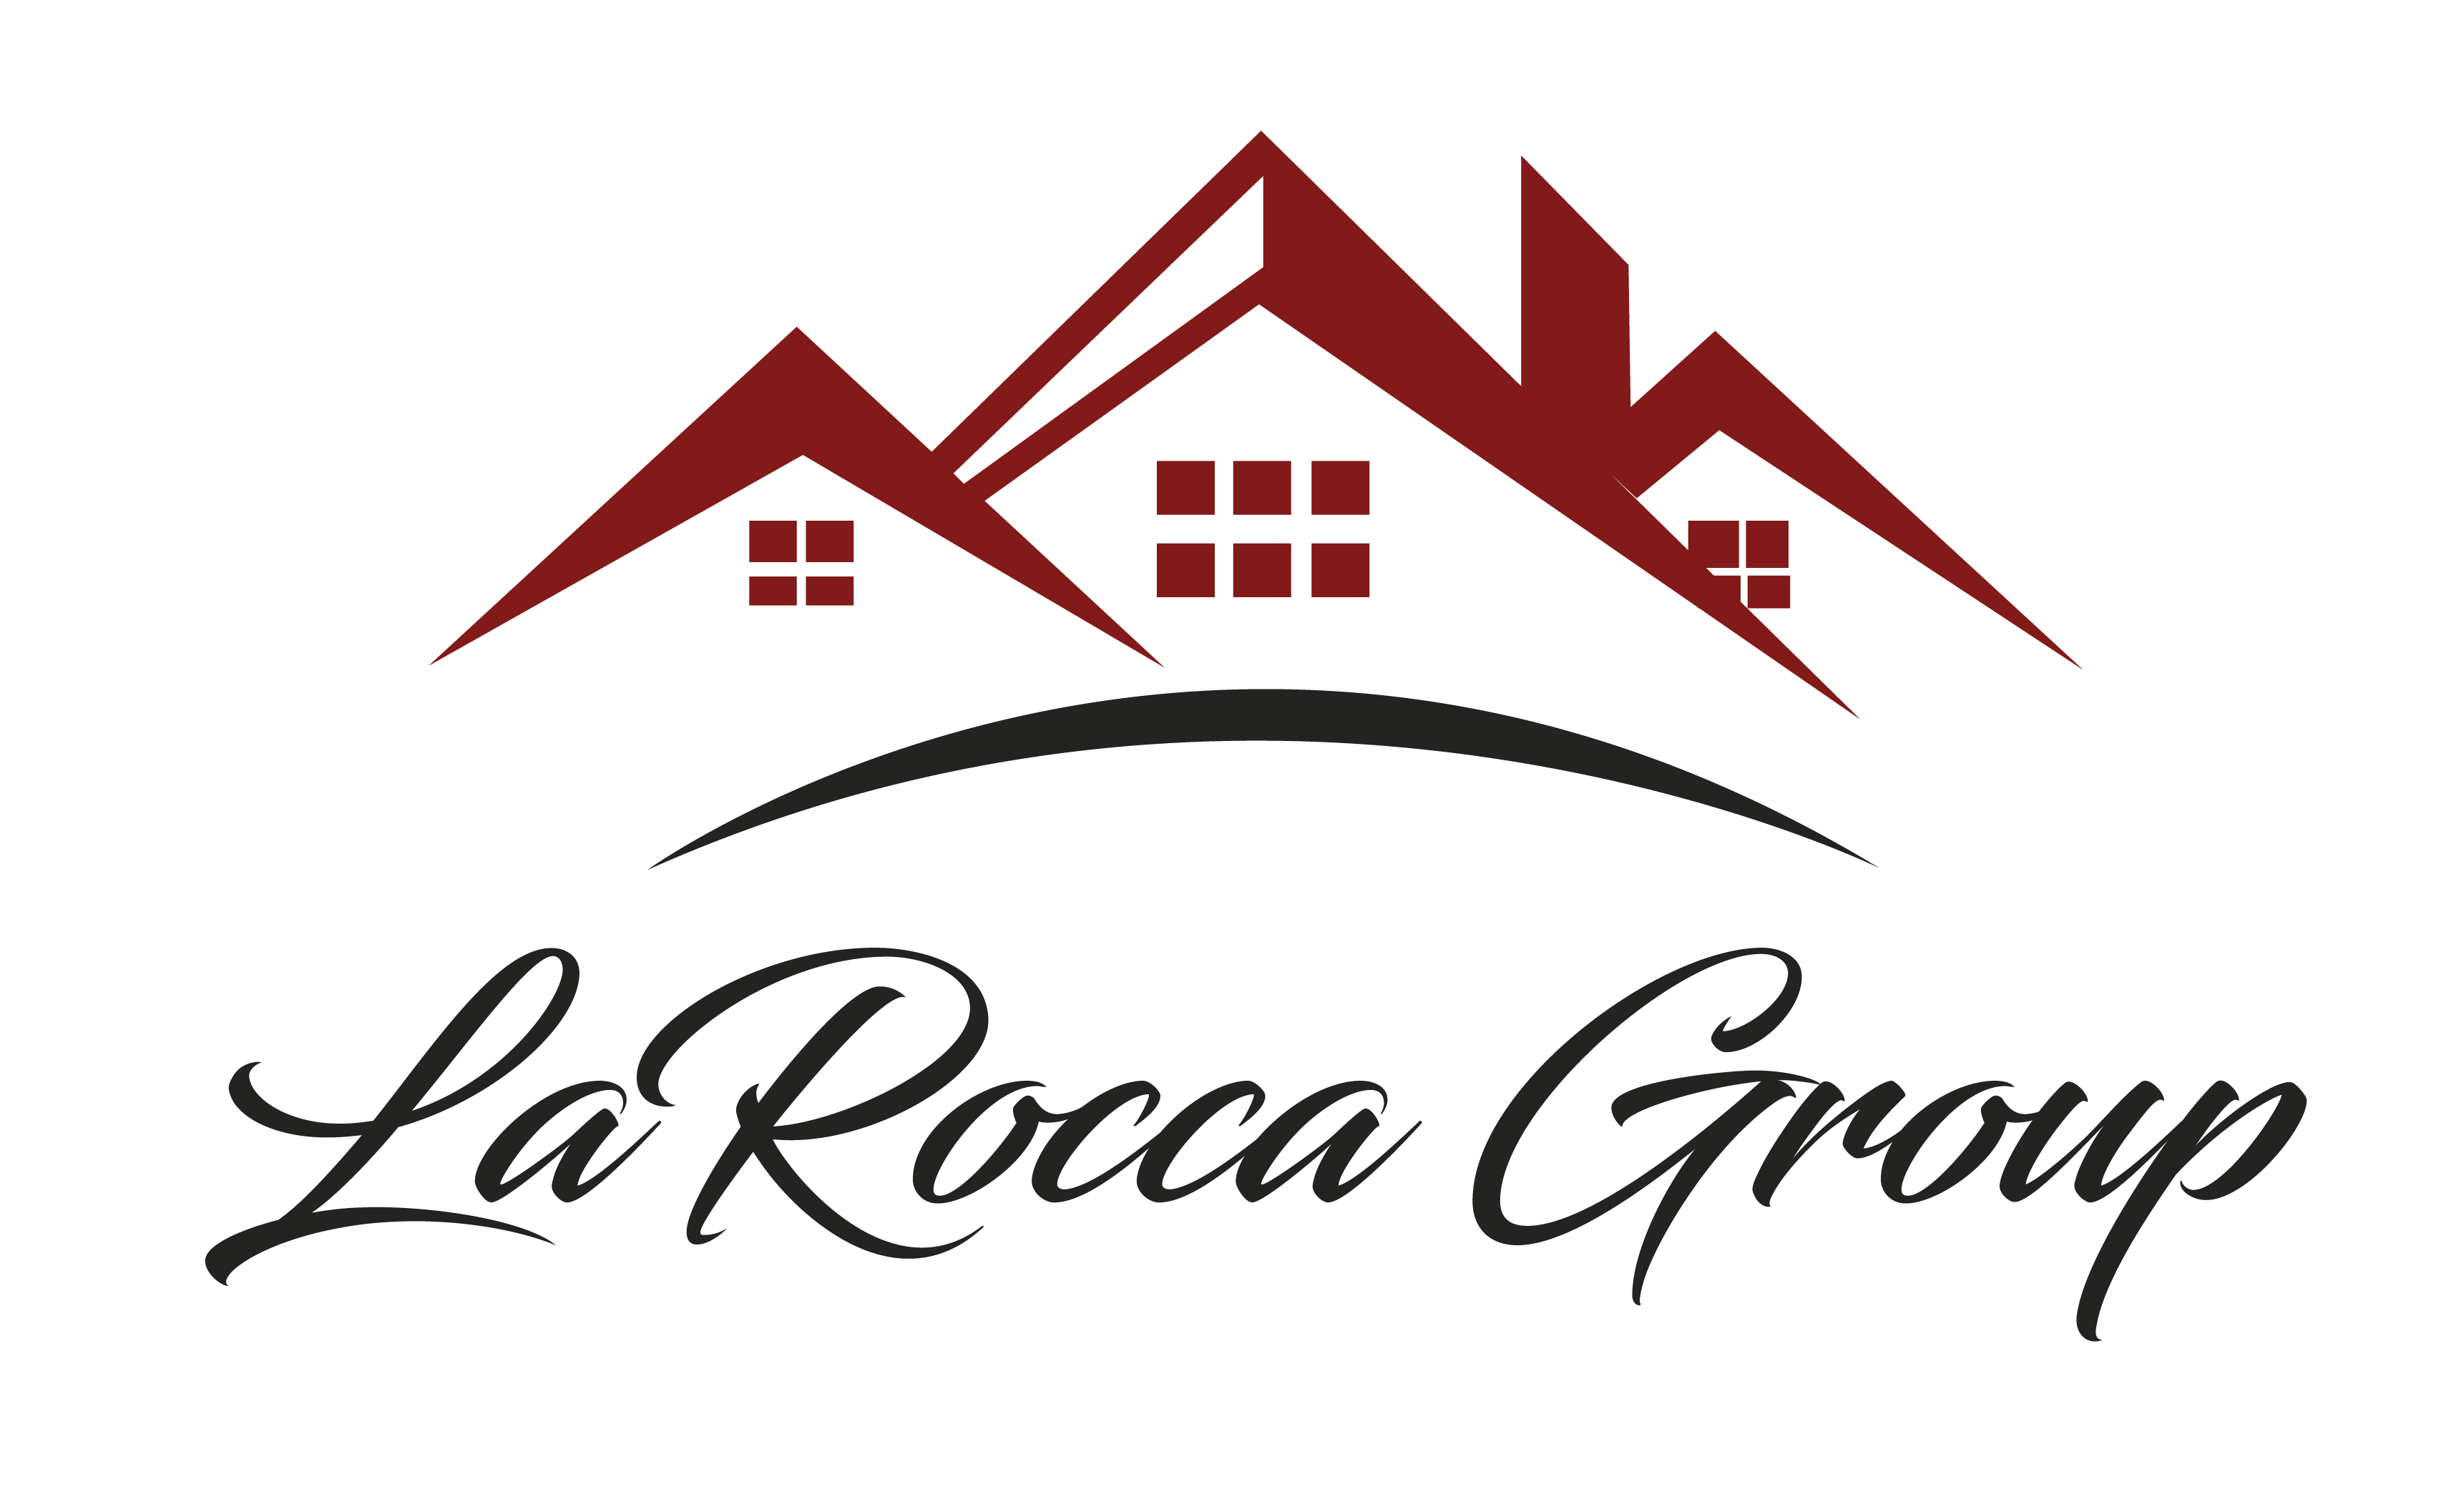 LaRocca Group logo